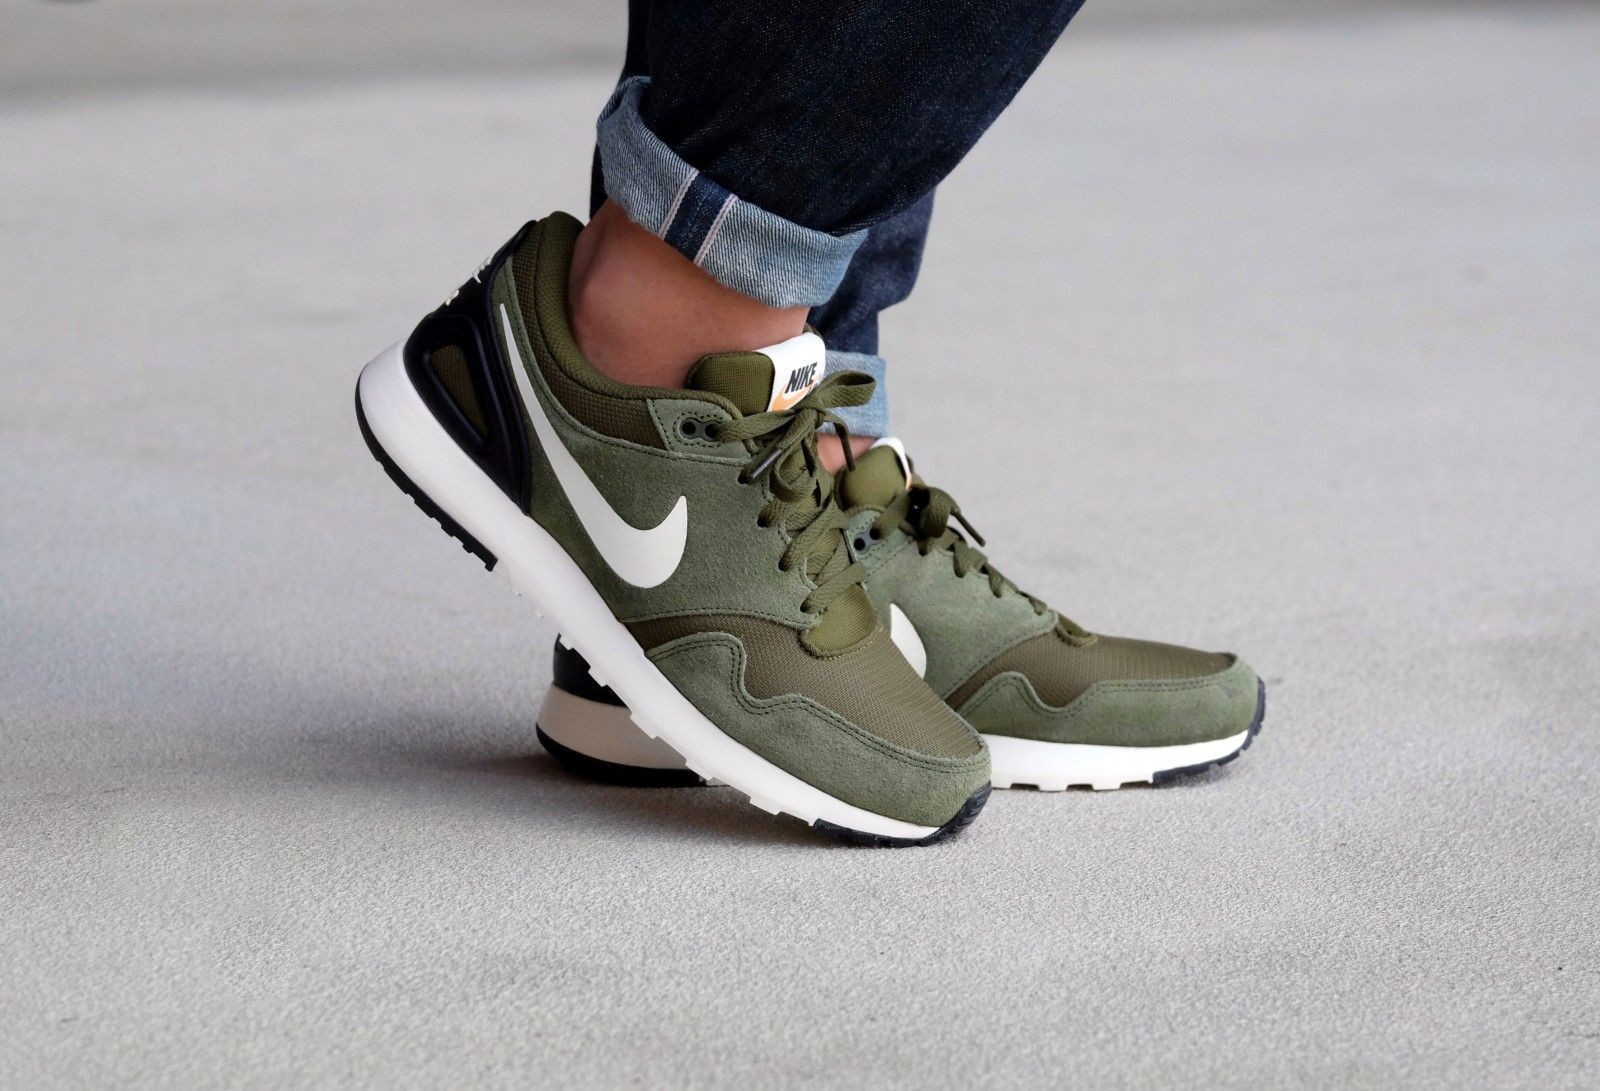 best website 7e49f bb3b8 Nike Air Vibenna Legion Green/Sail-Black - 866069-300 | the shoe ...